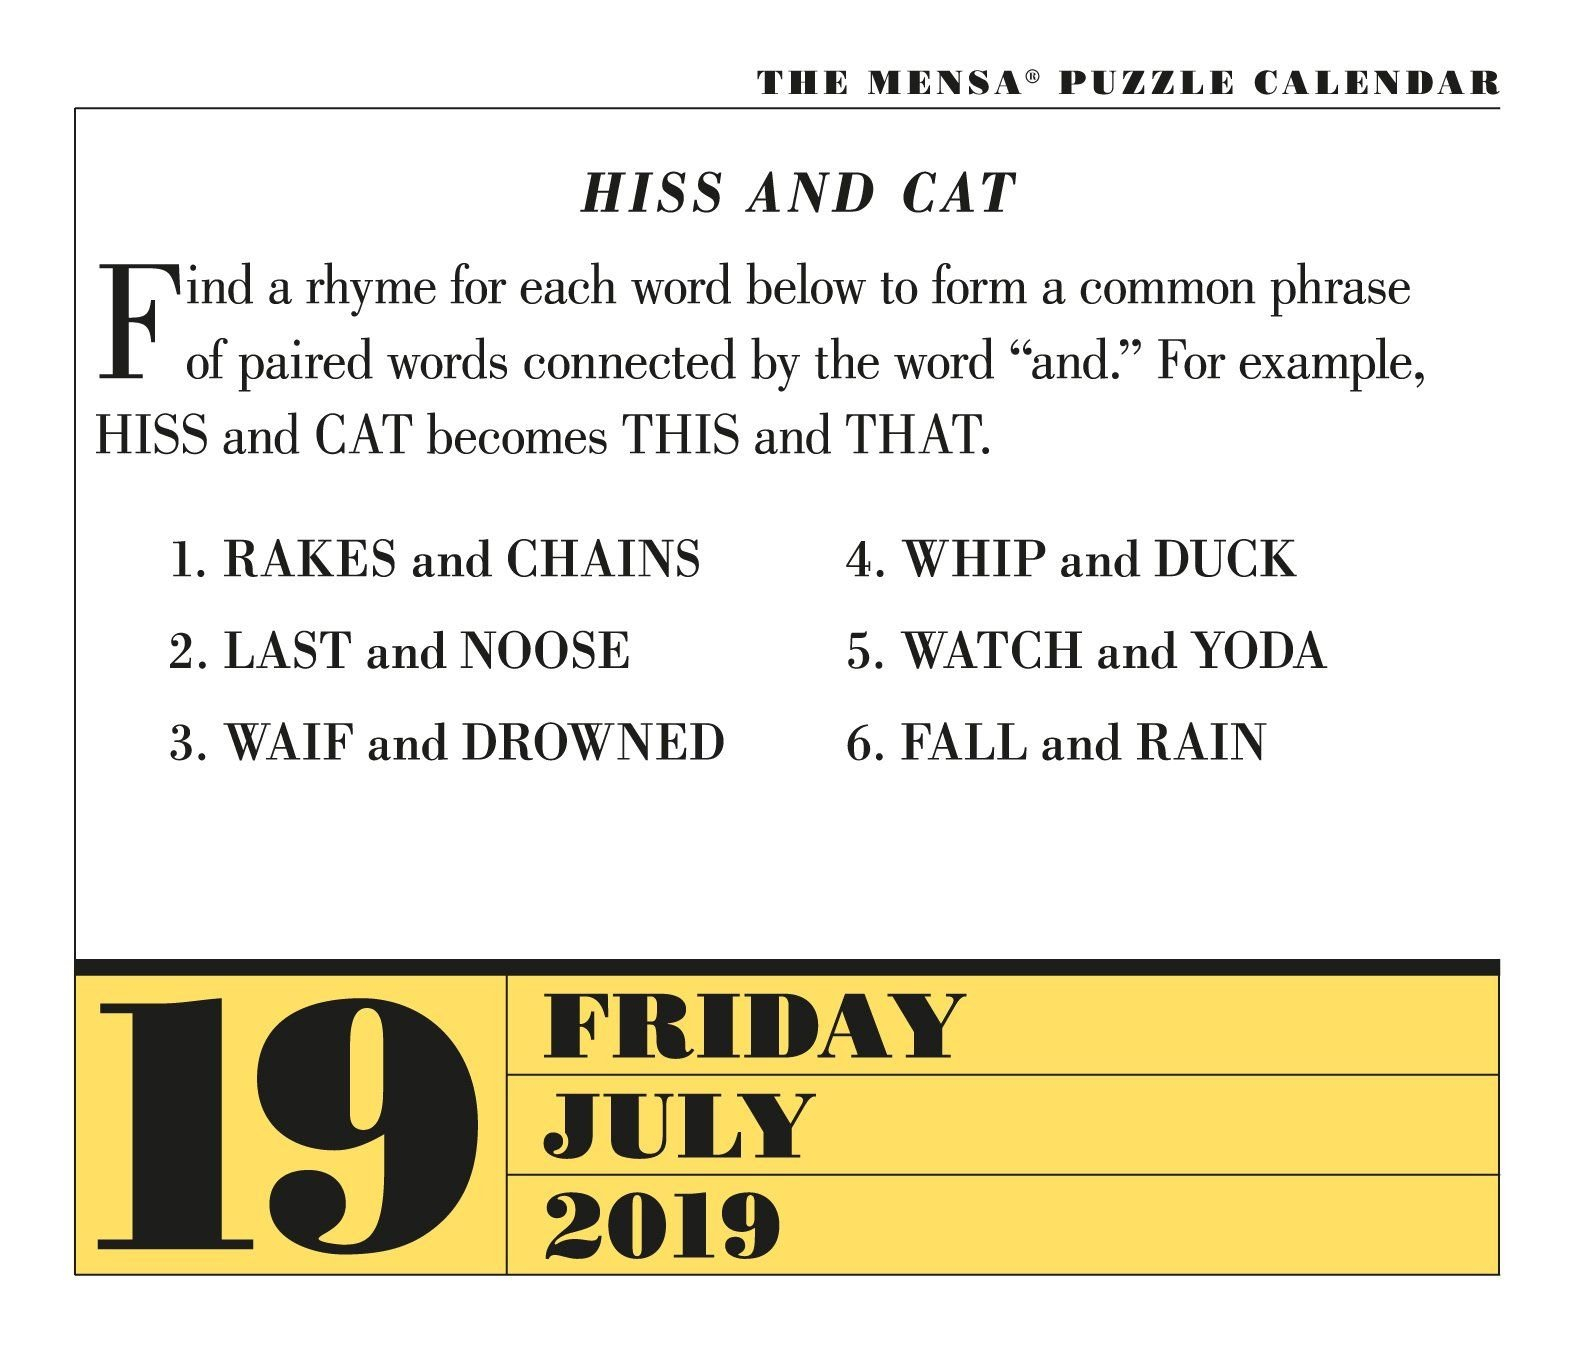 365 Countdown Calendar | Calendar For Planning 365 Day Count Calendar